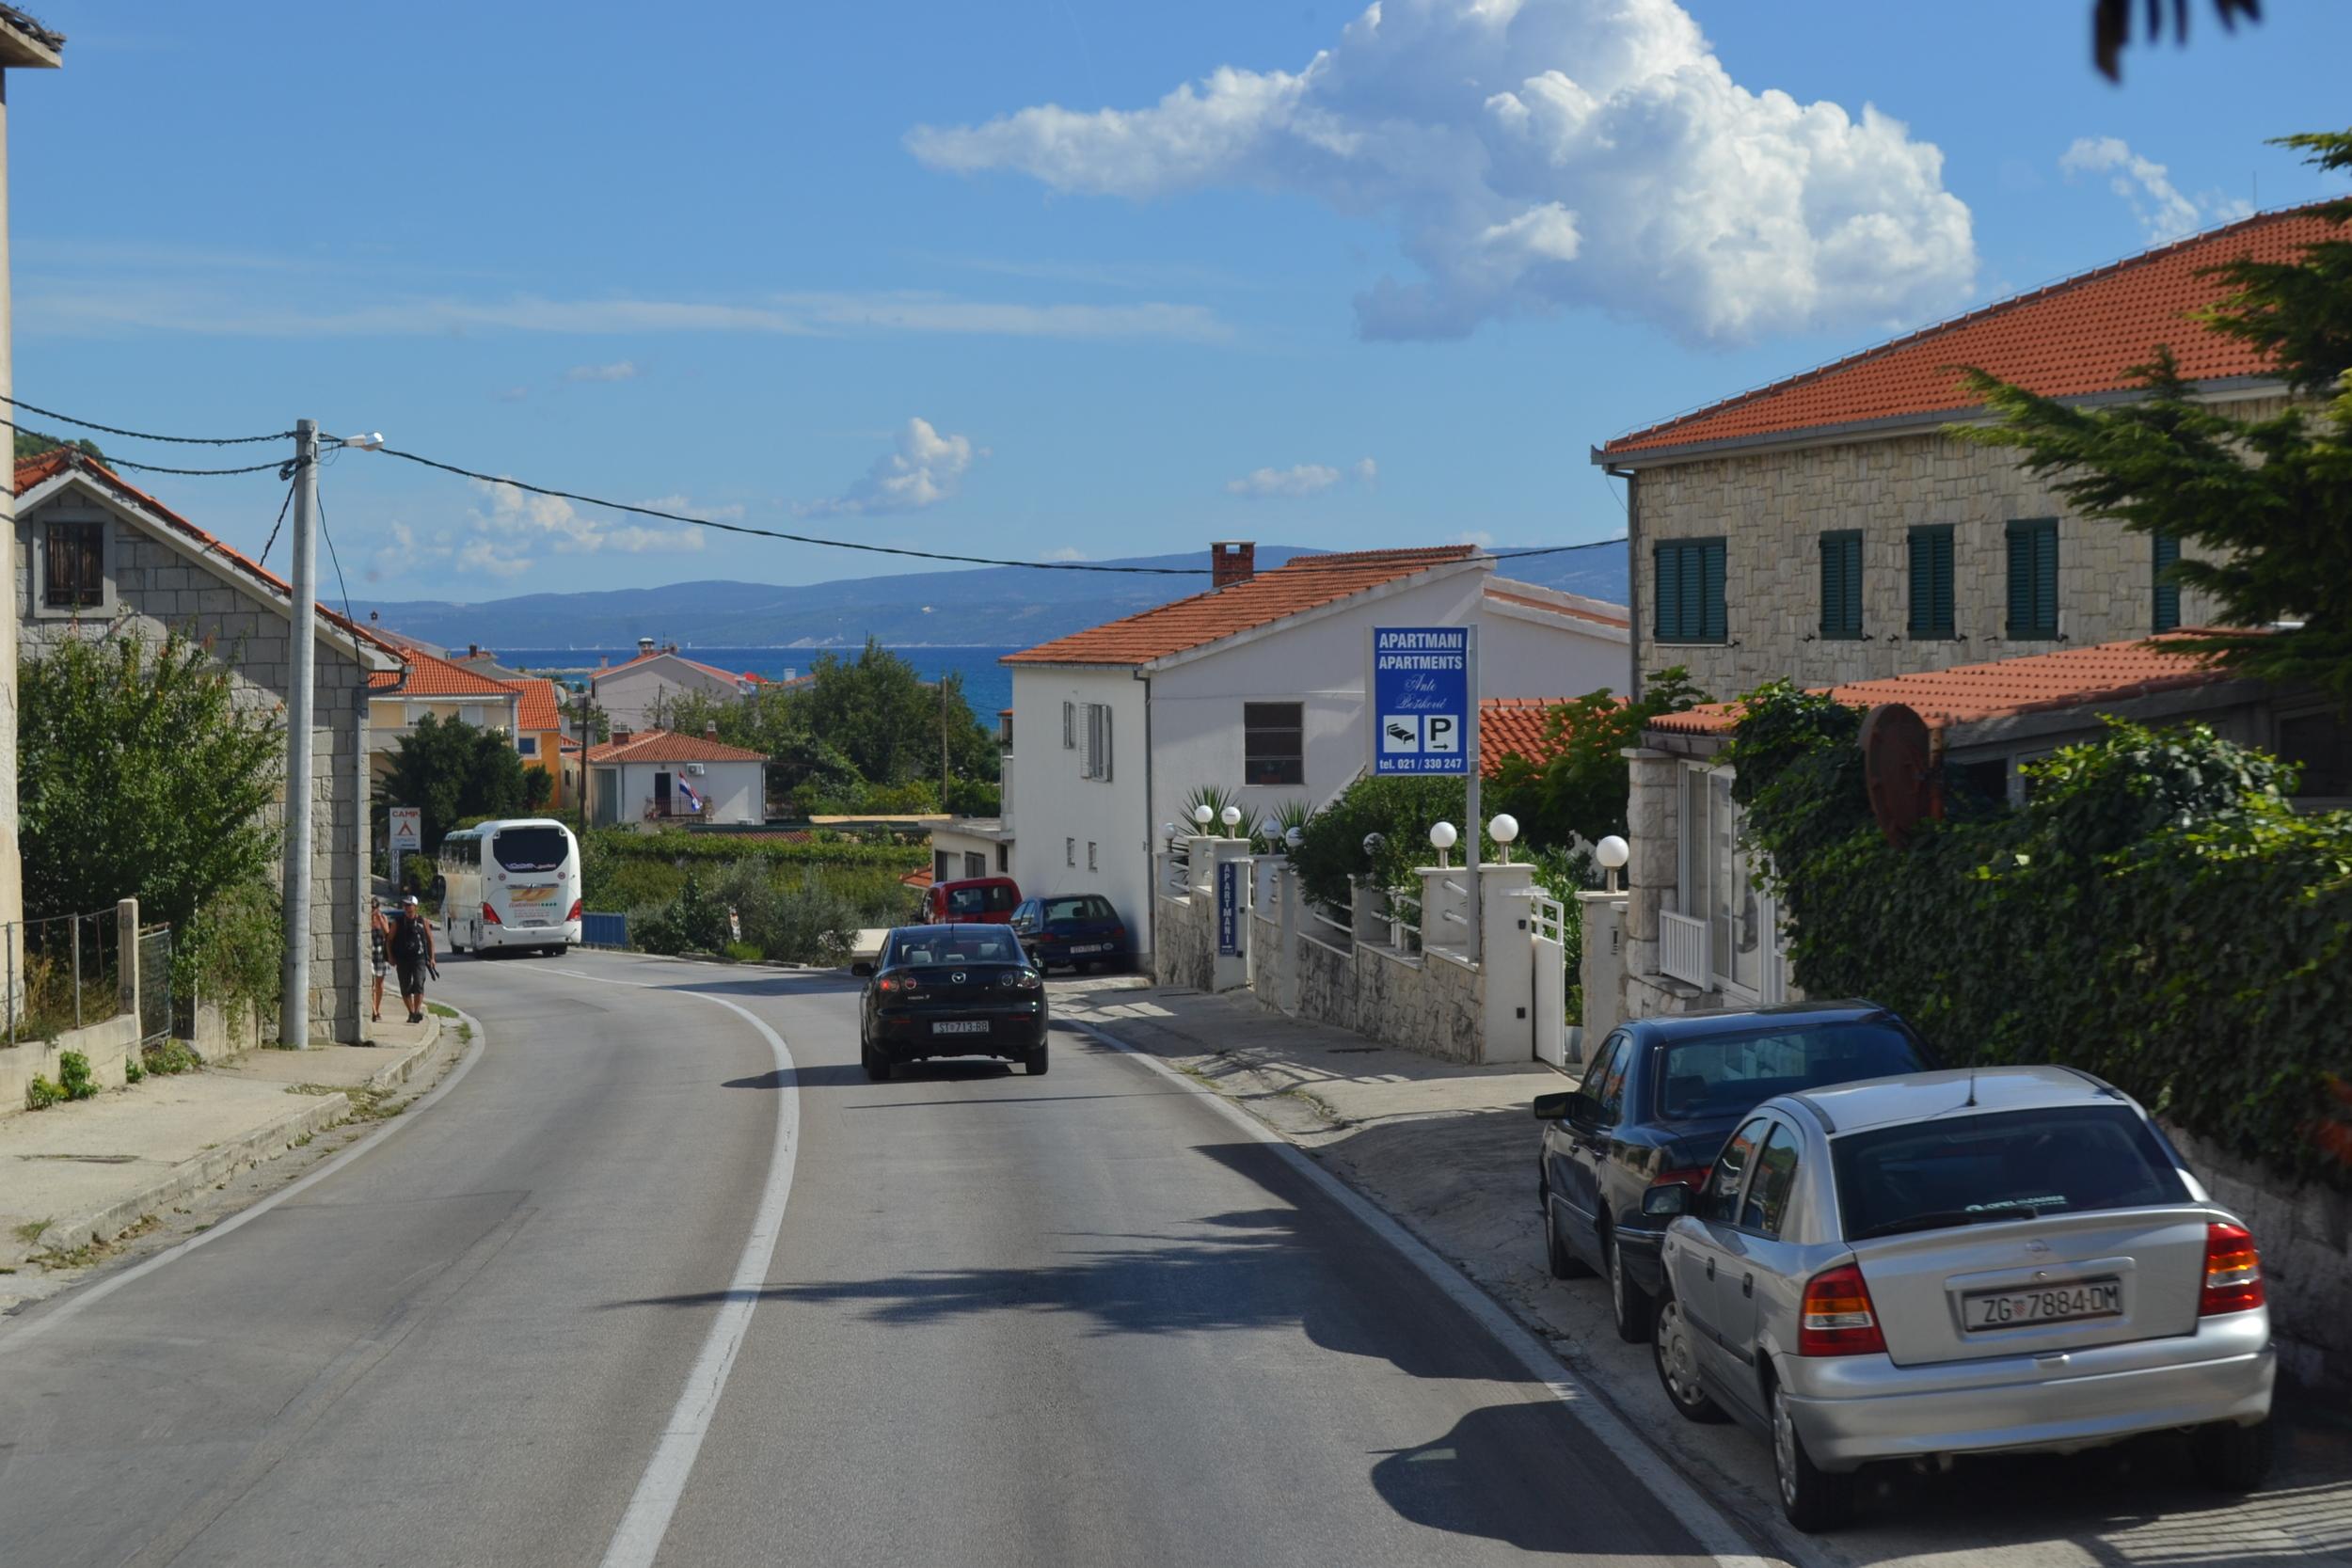 Driving in Croatia